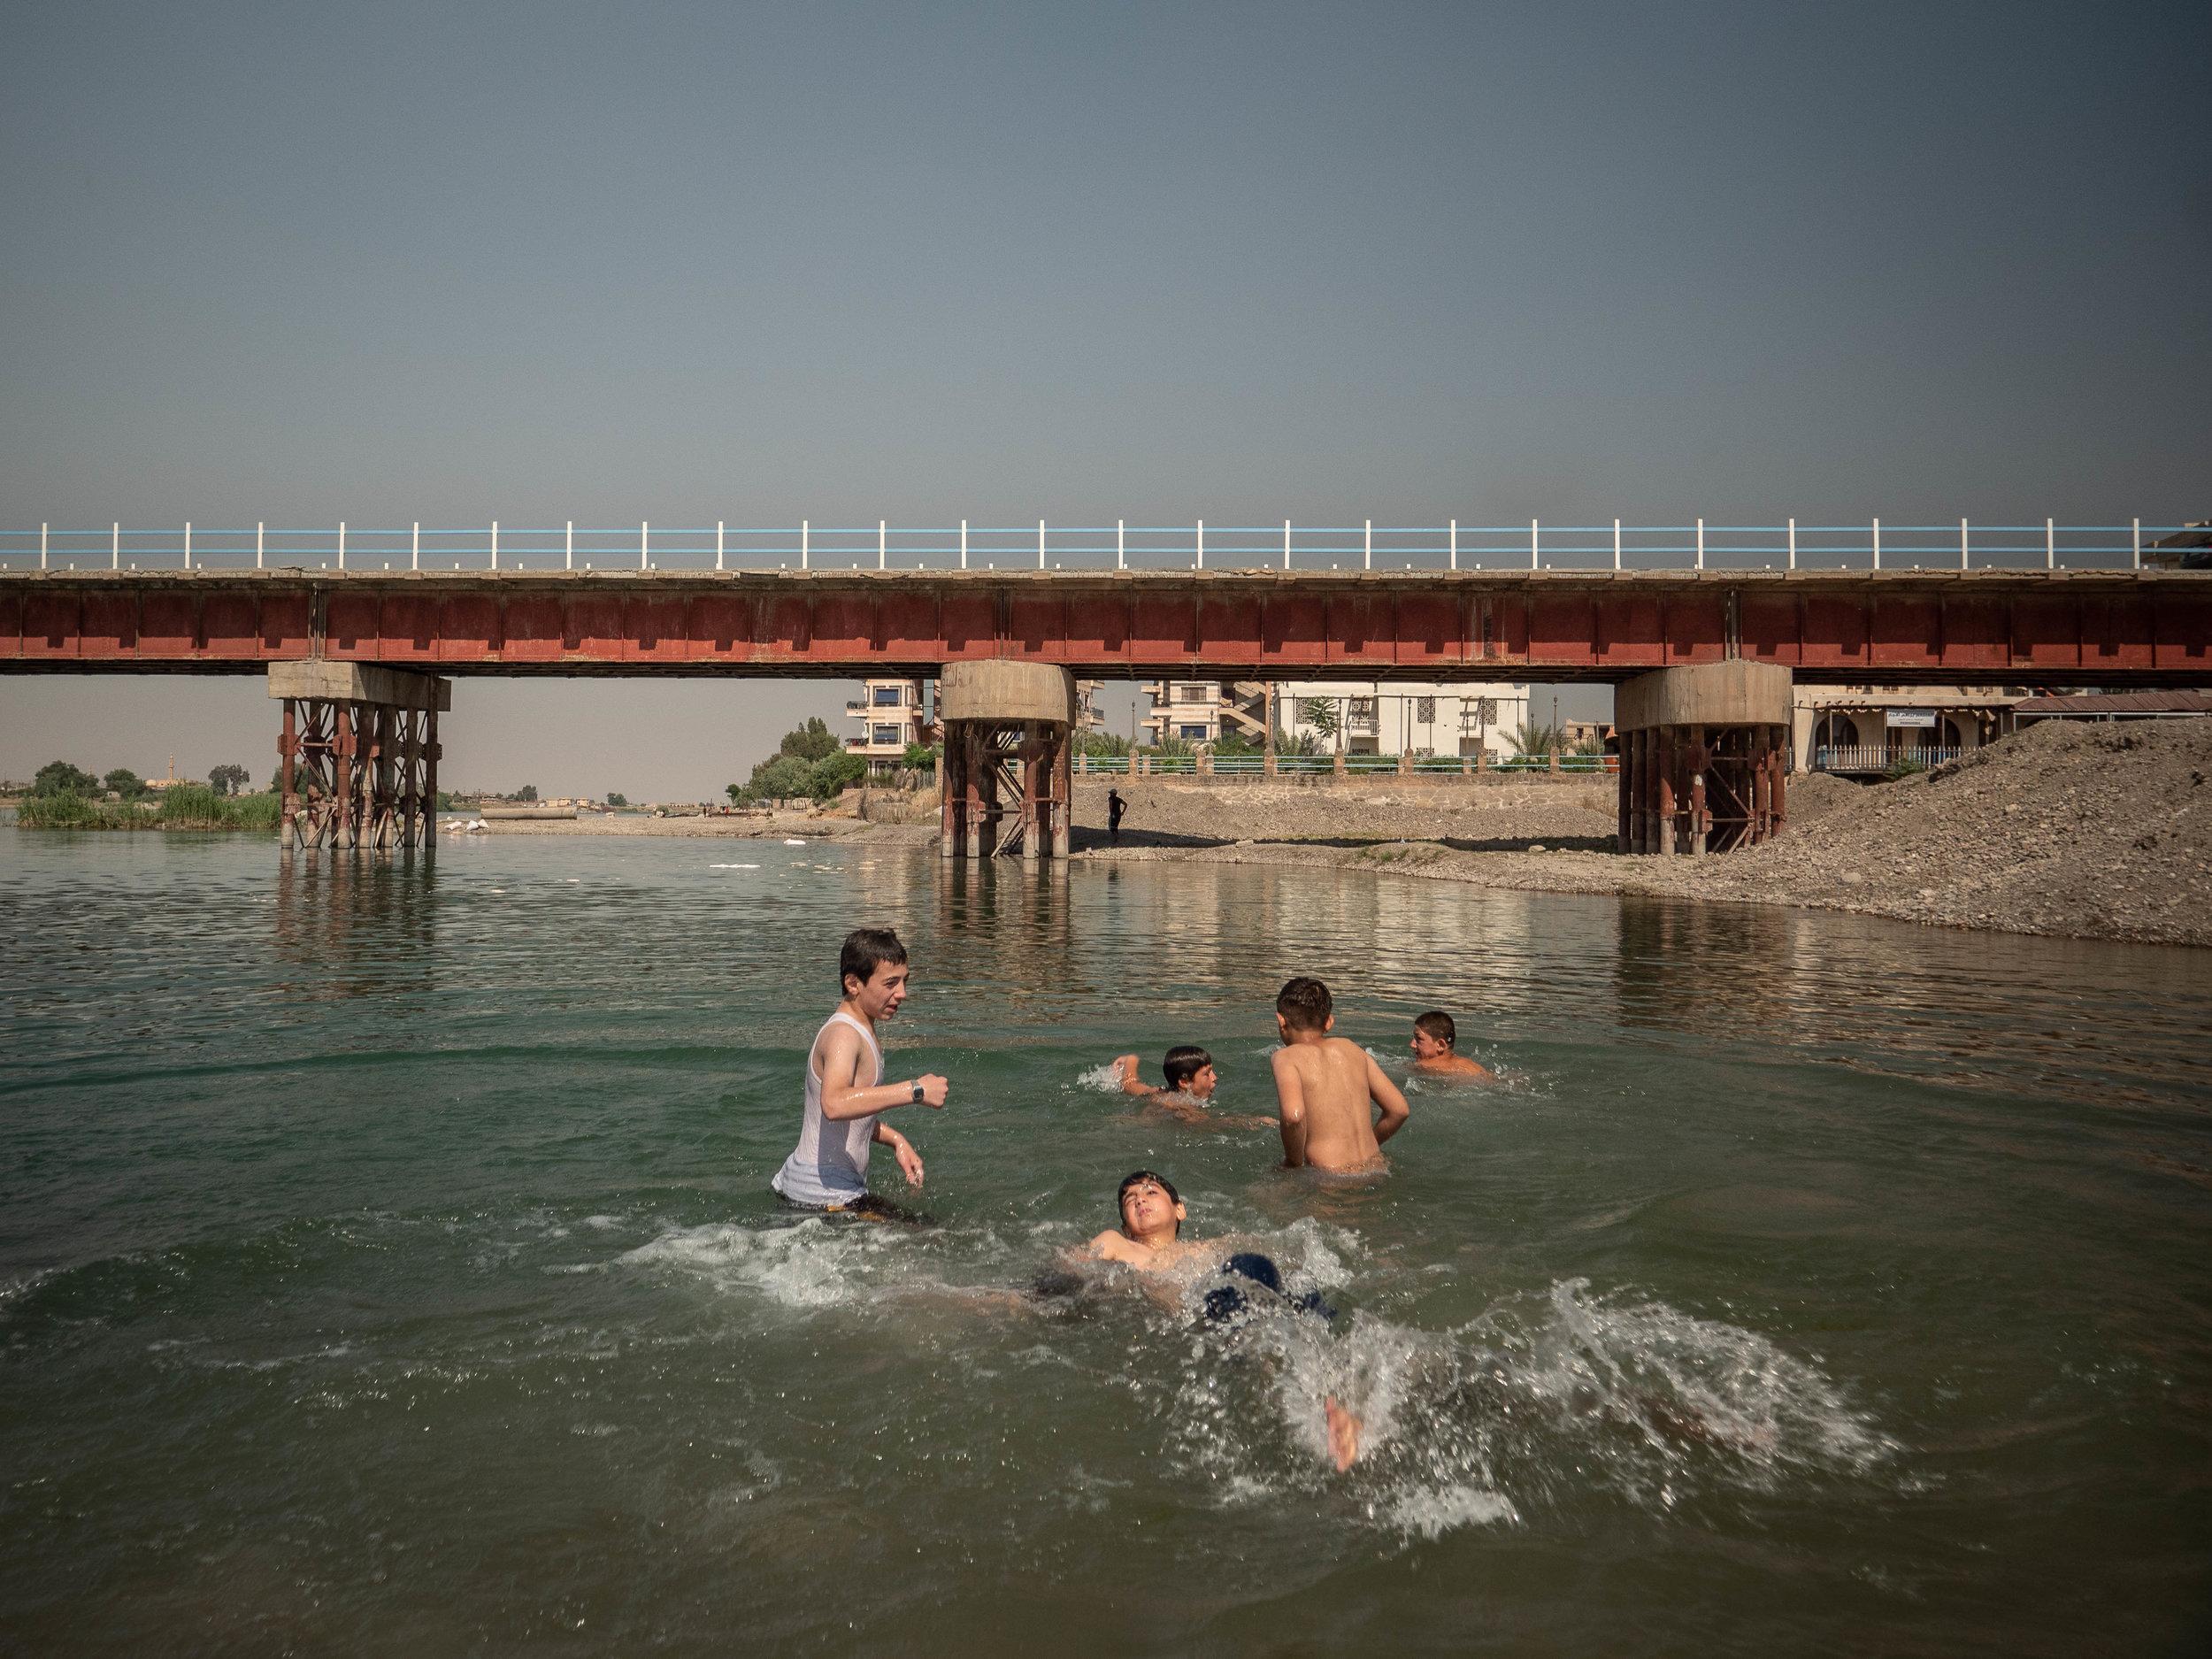 29/05/19, Raqqa, Syria - A group of boys swim in the Euphrates river in Raqqa.